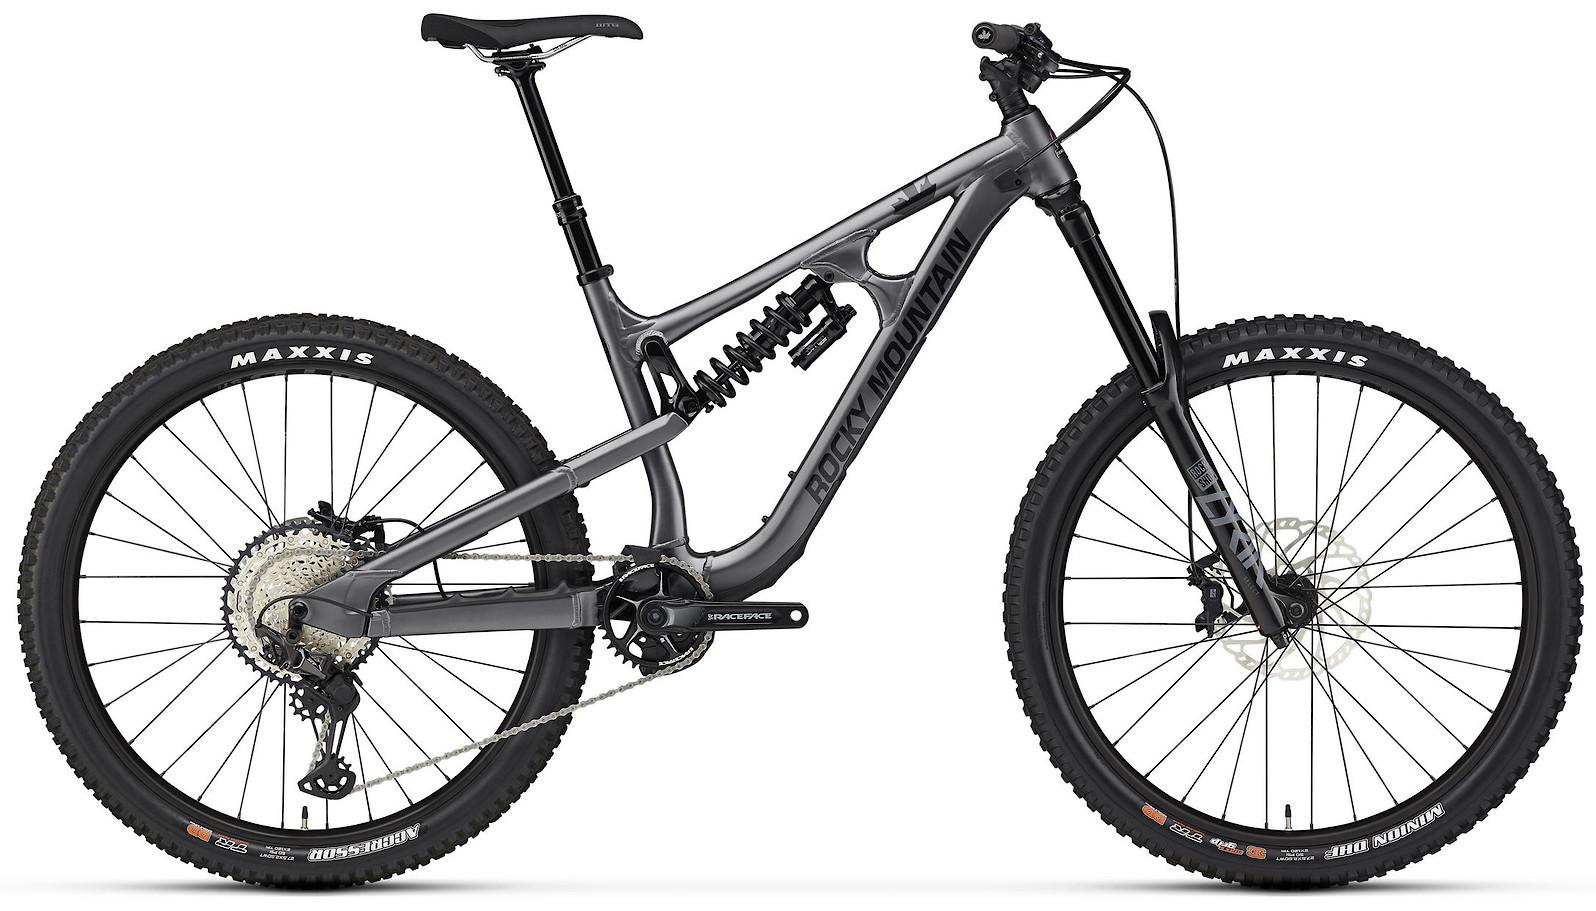 2020 Rocky Mountain Slayer Alloy 50 27.5 Gray and Black